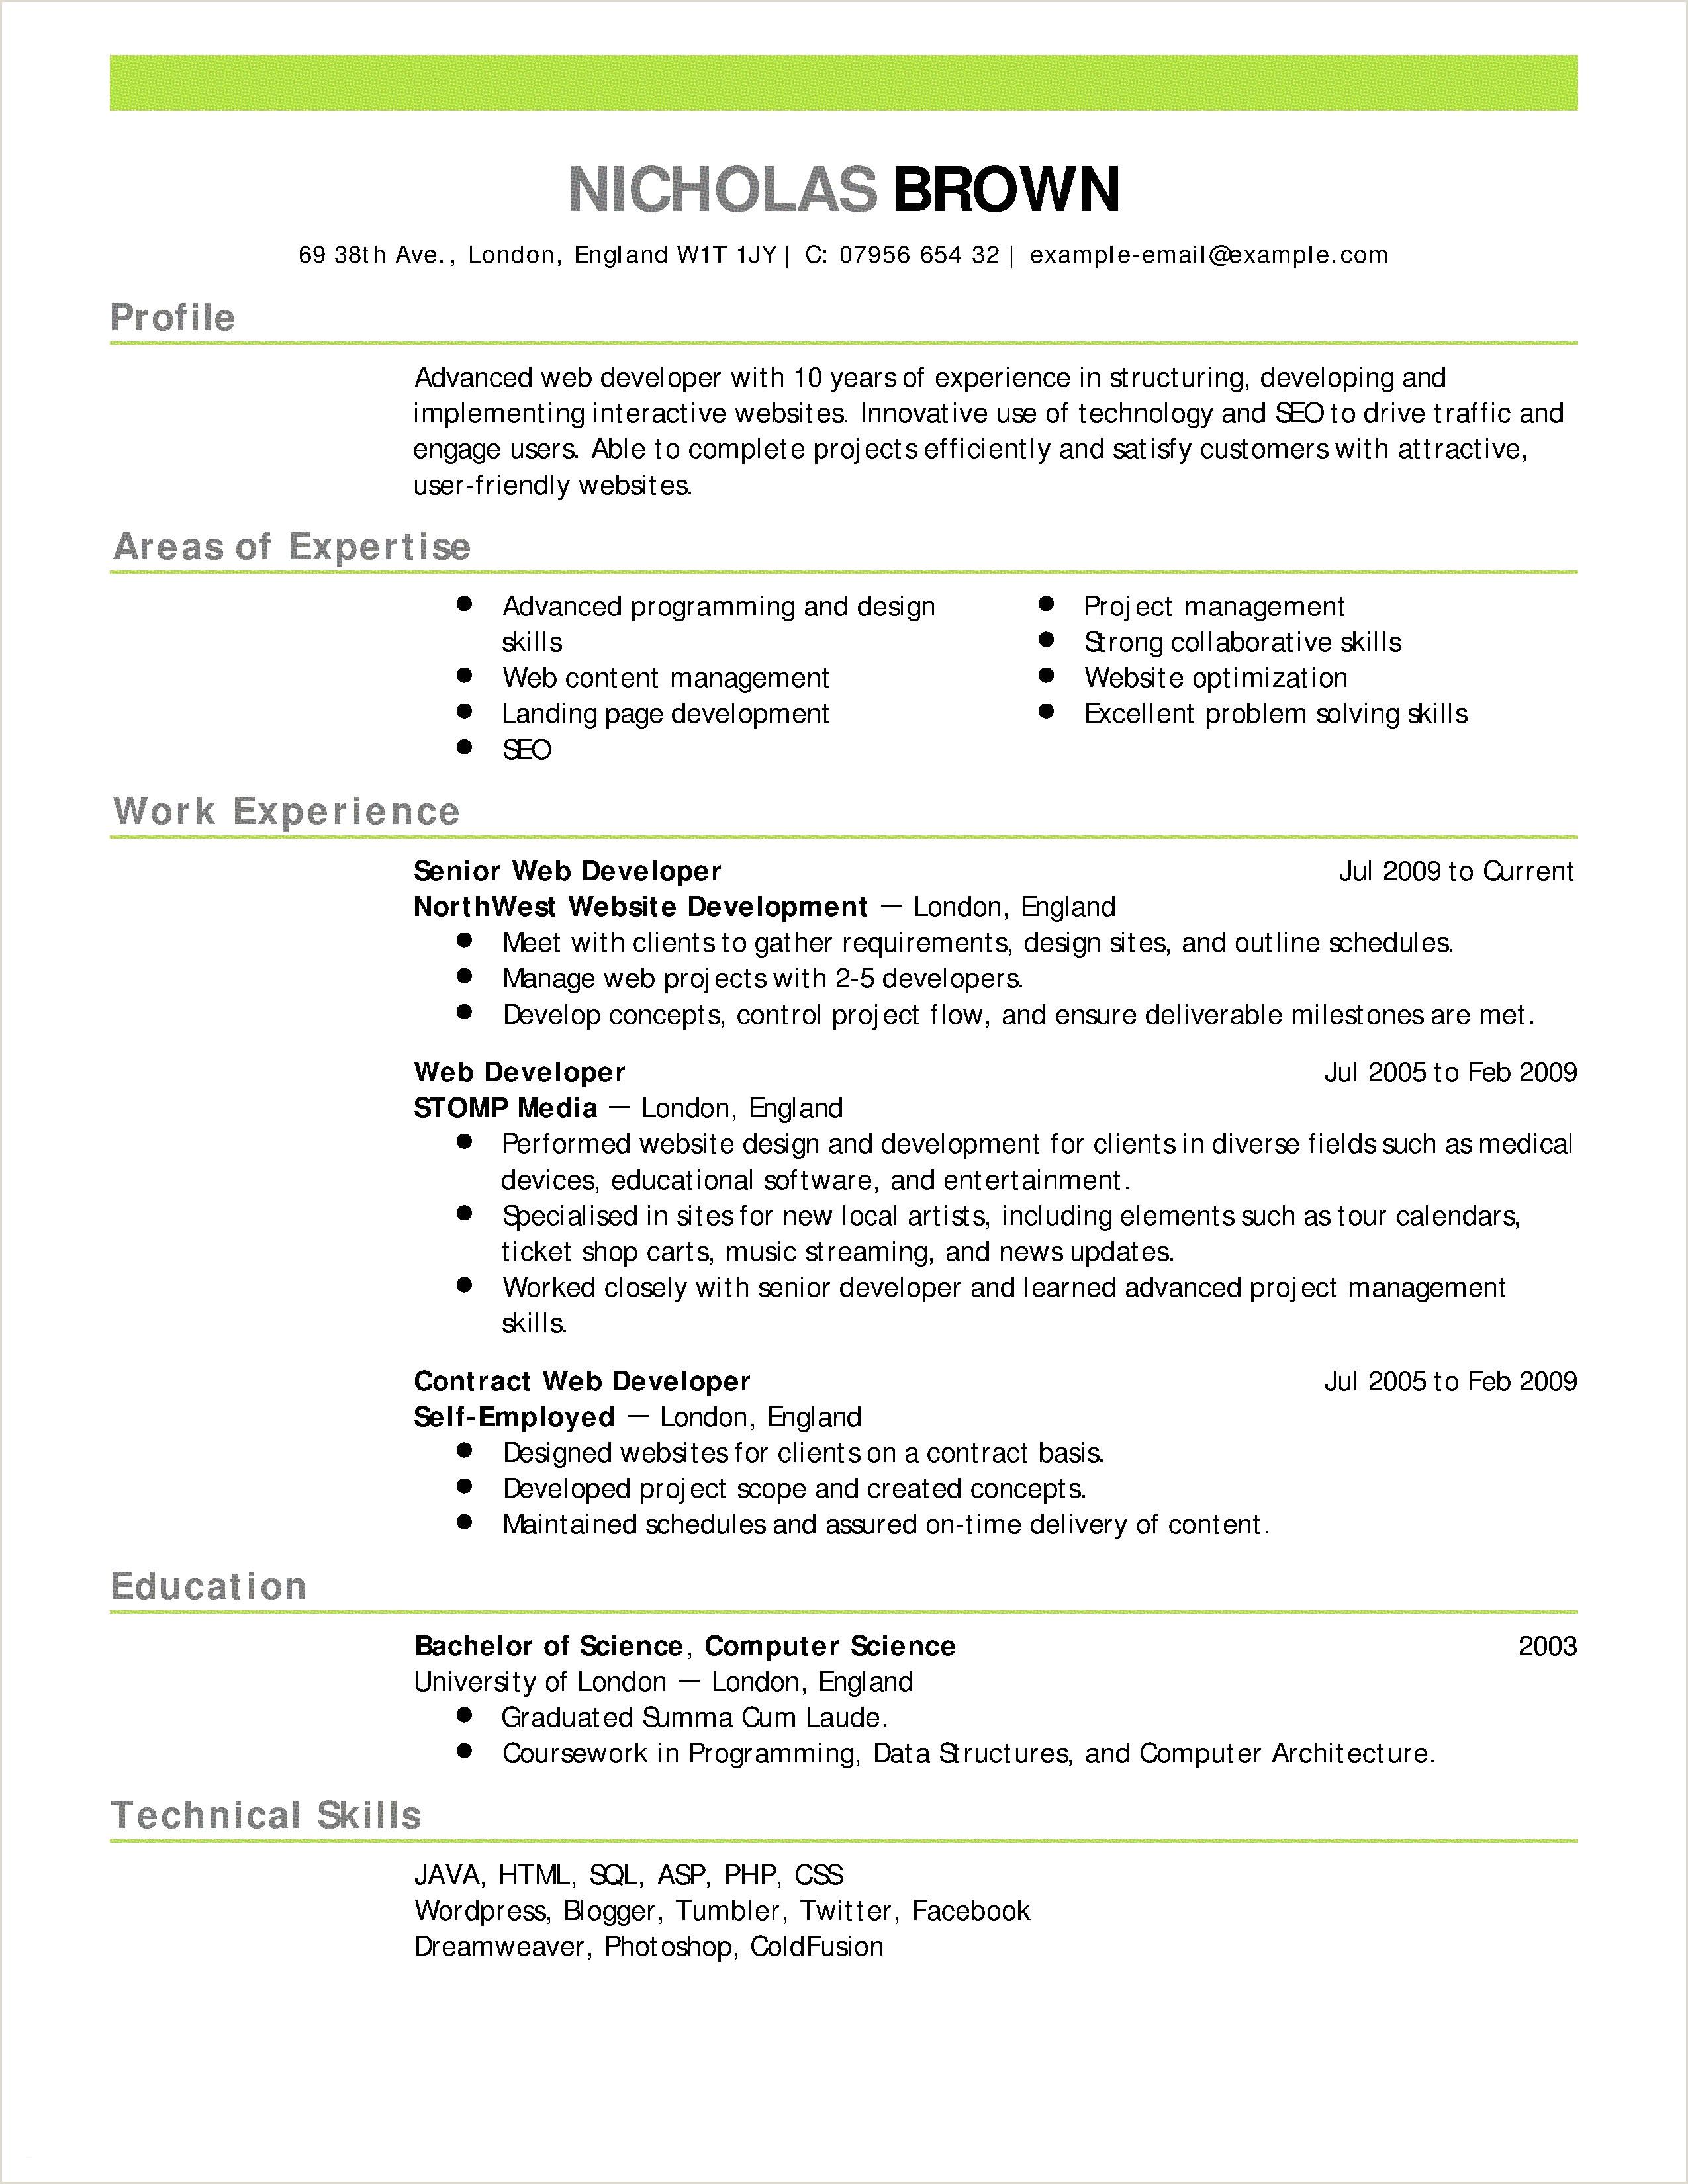 Human Resource Manager Resume Sample Human Resource Manager Resume Example Awesome Hr Manager